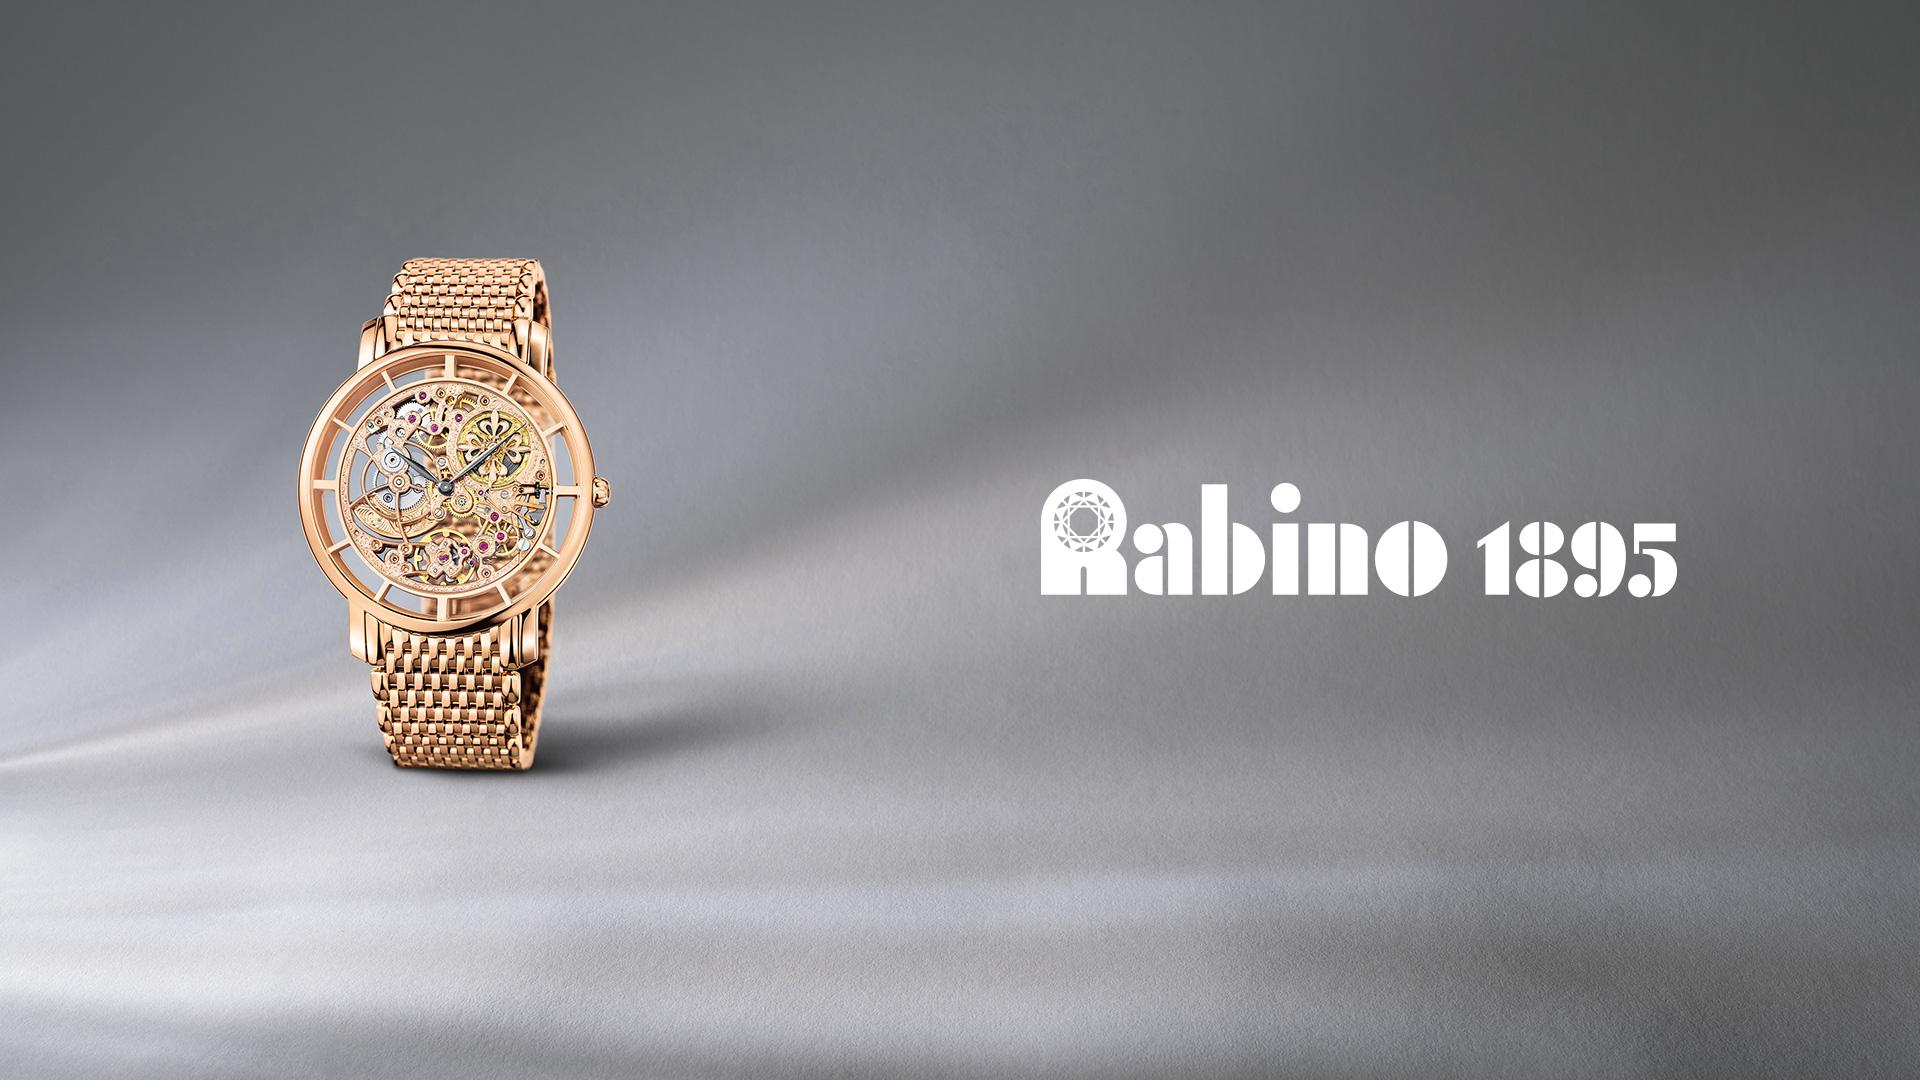 Rabino_Regroup.agency Cuneo